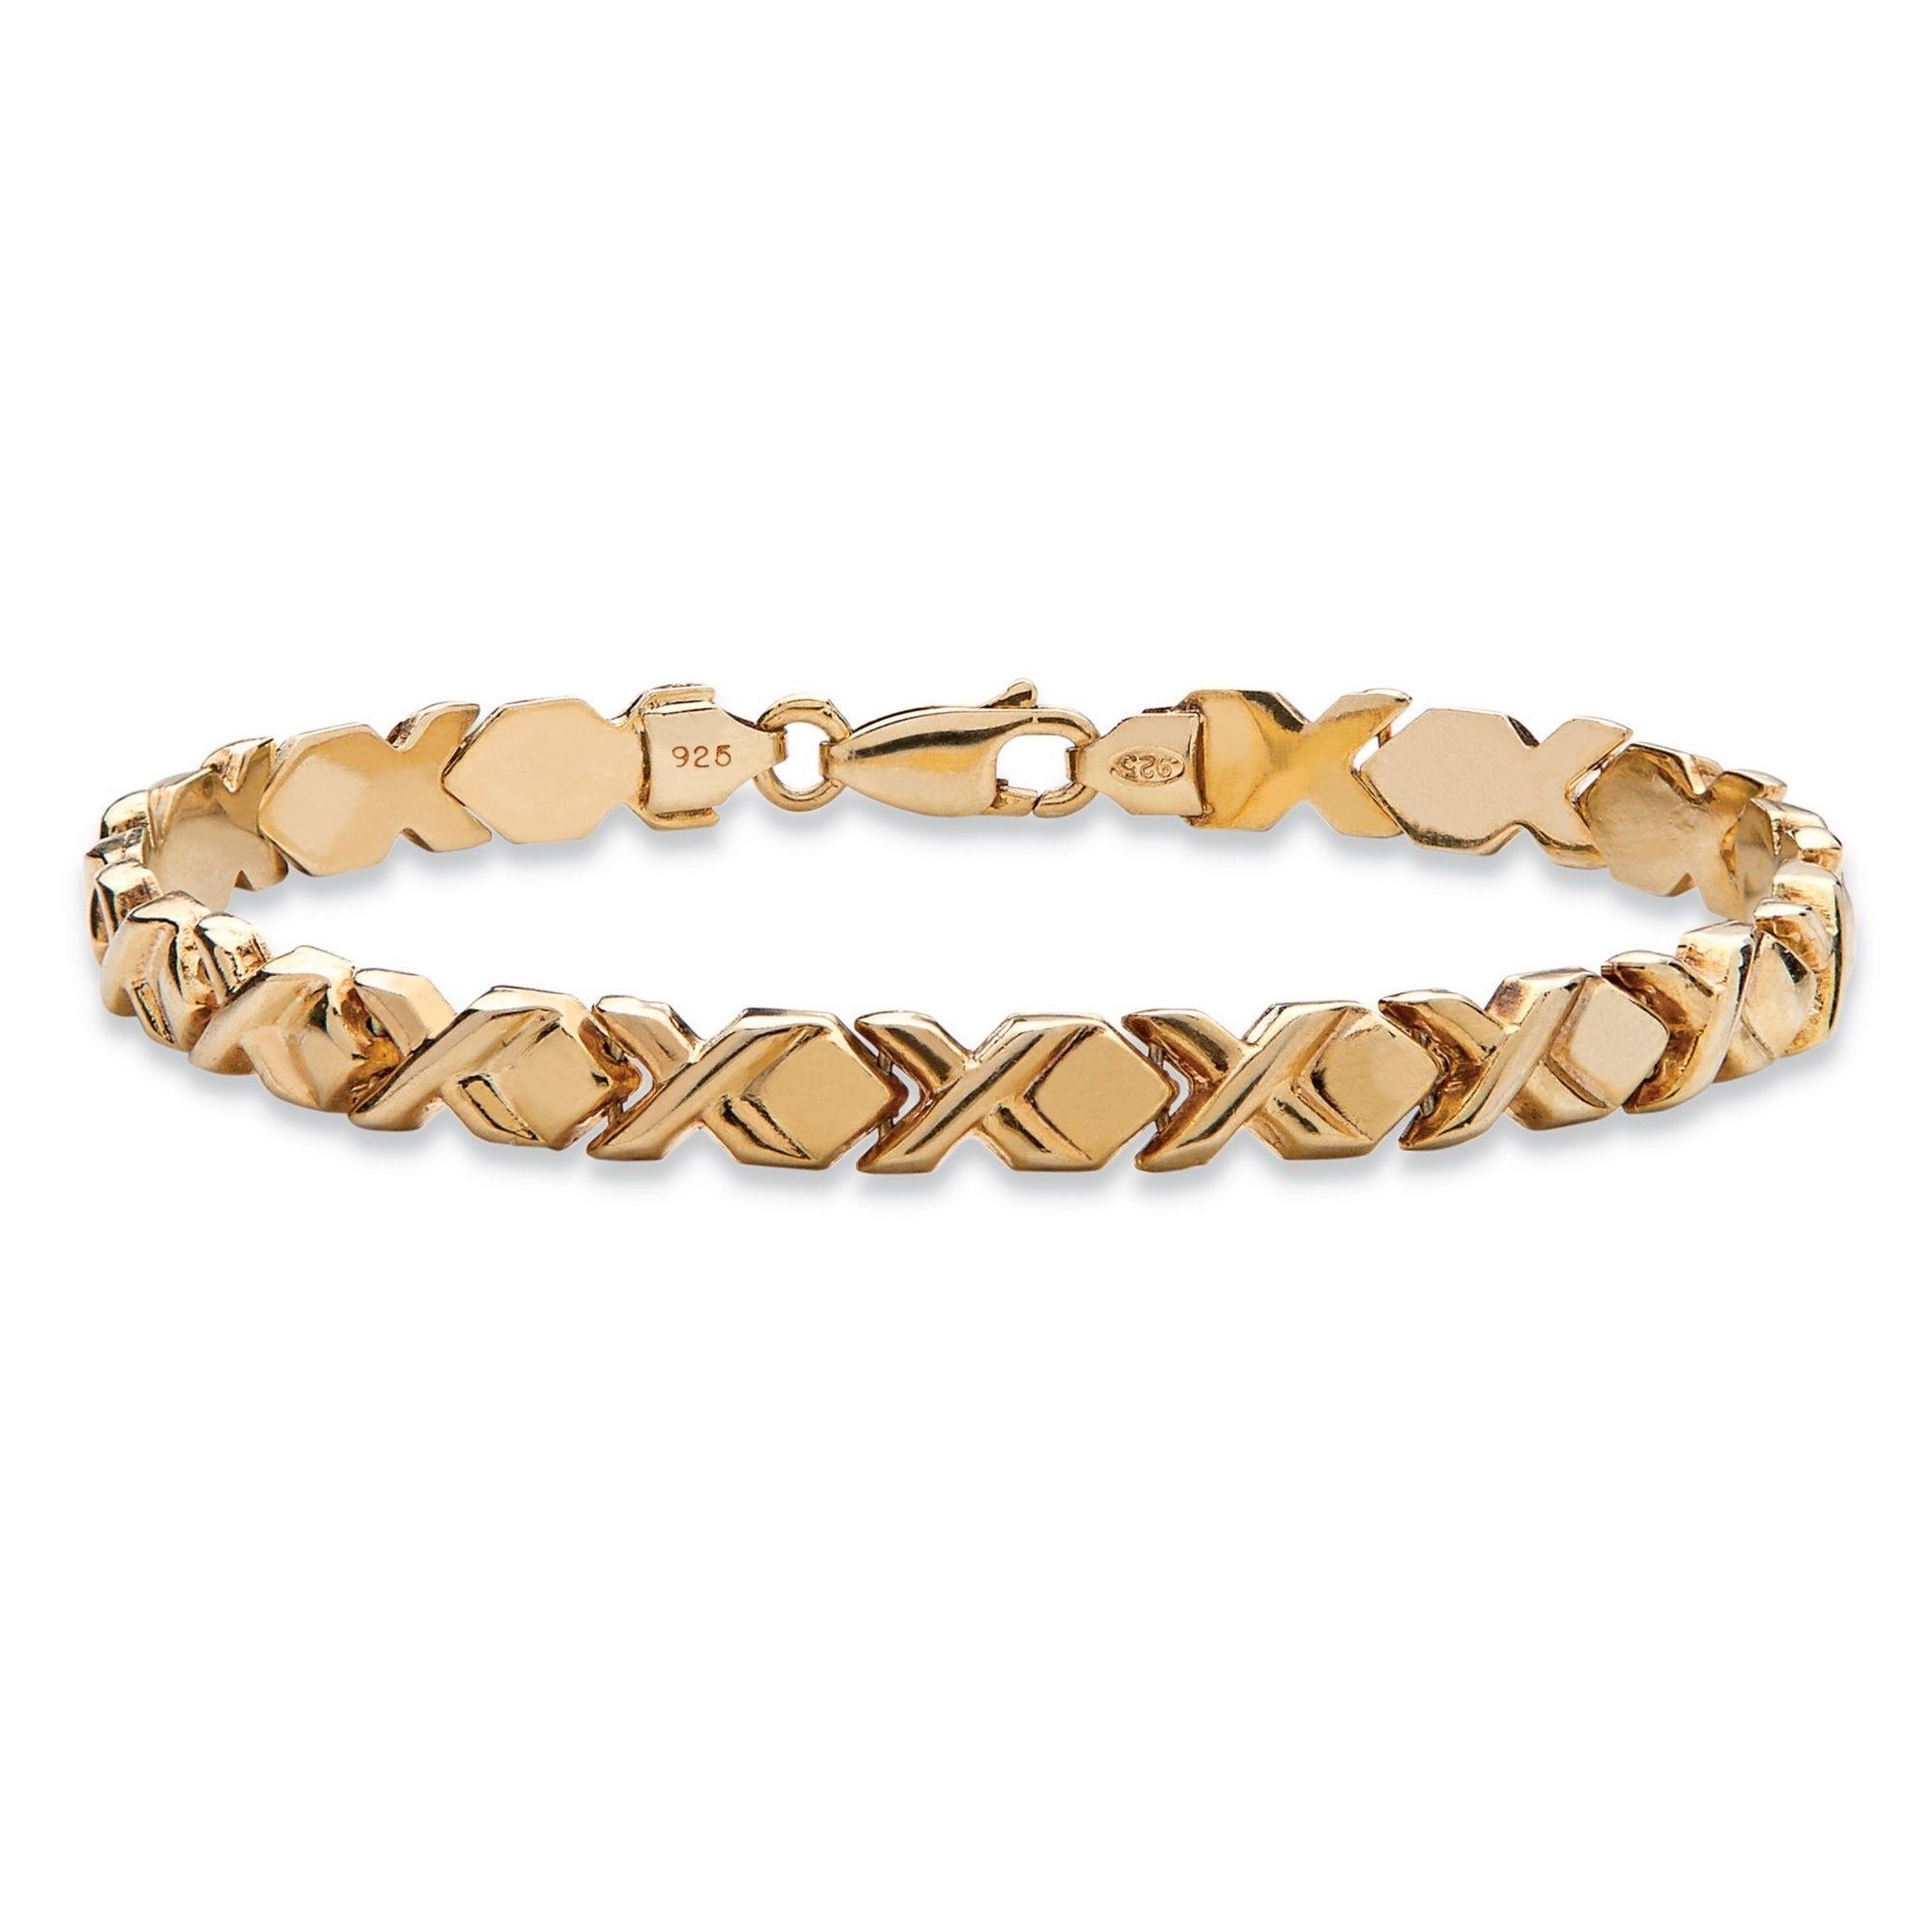 Palm Beach Jewelry PalmBeach 14k Gold over Silver Stampato-Link Bracelet